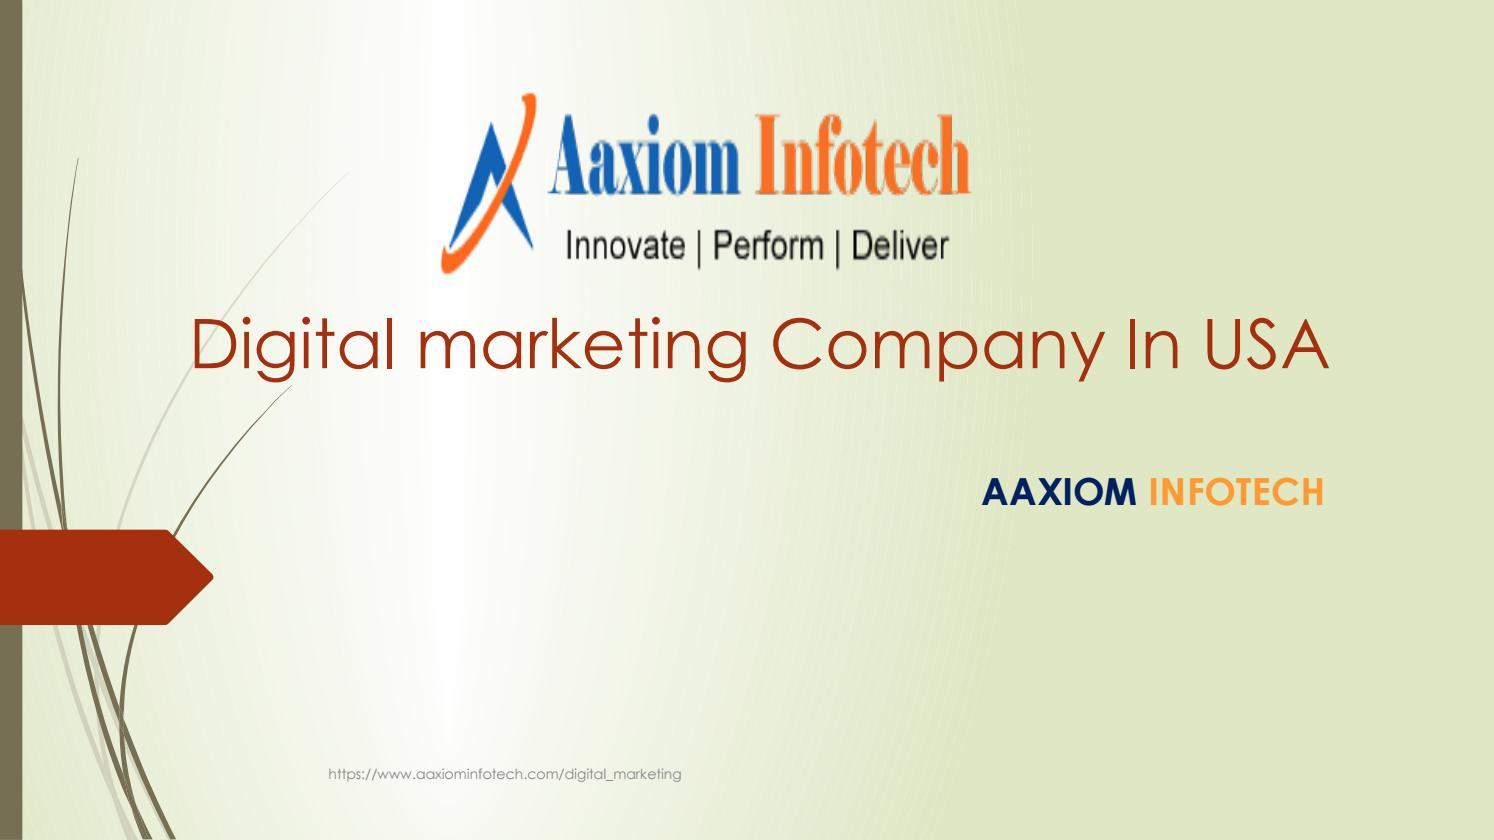 Aaxiom Infotech a digital marketing company in usa by Aaxiom